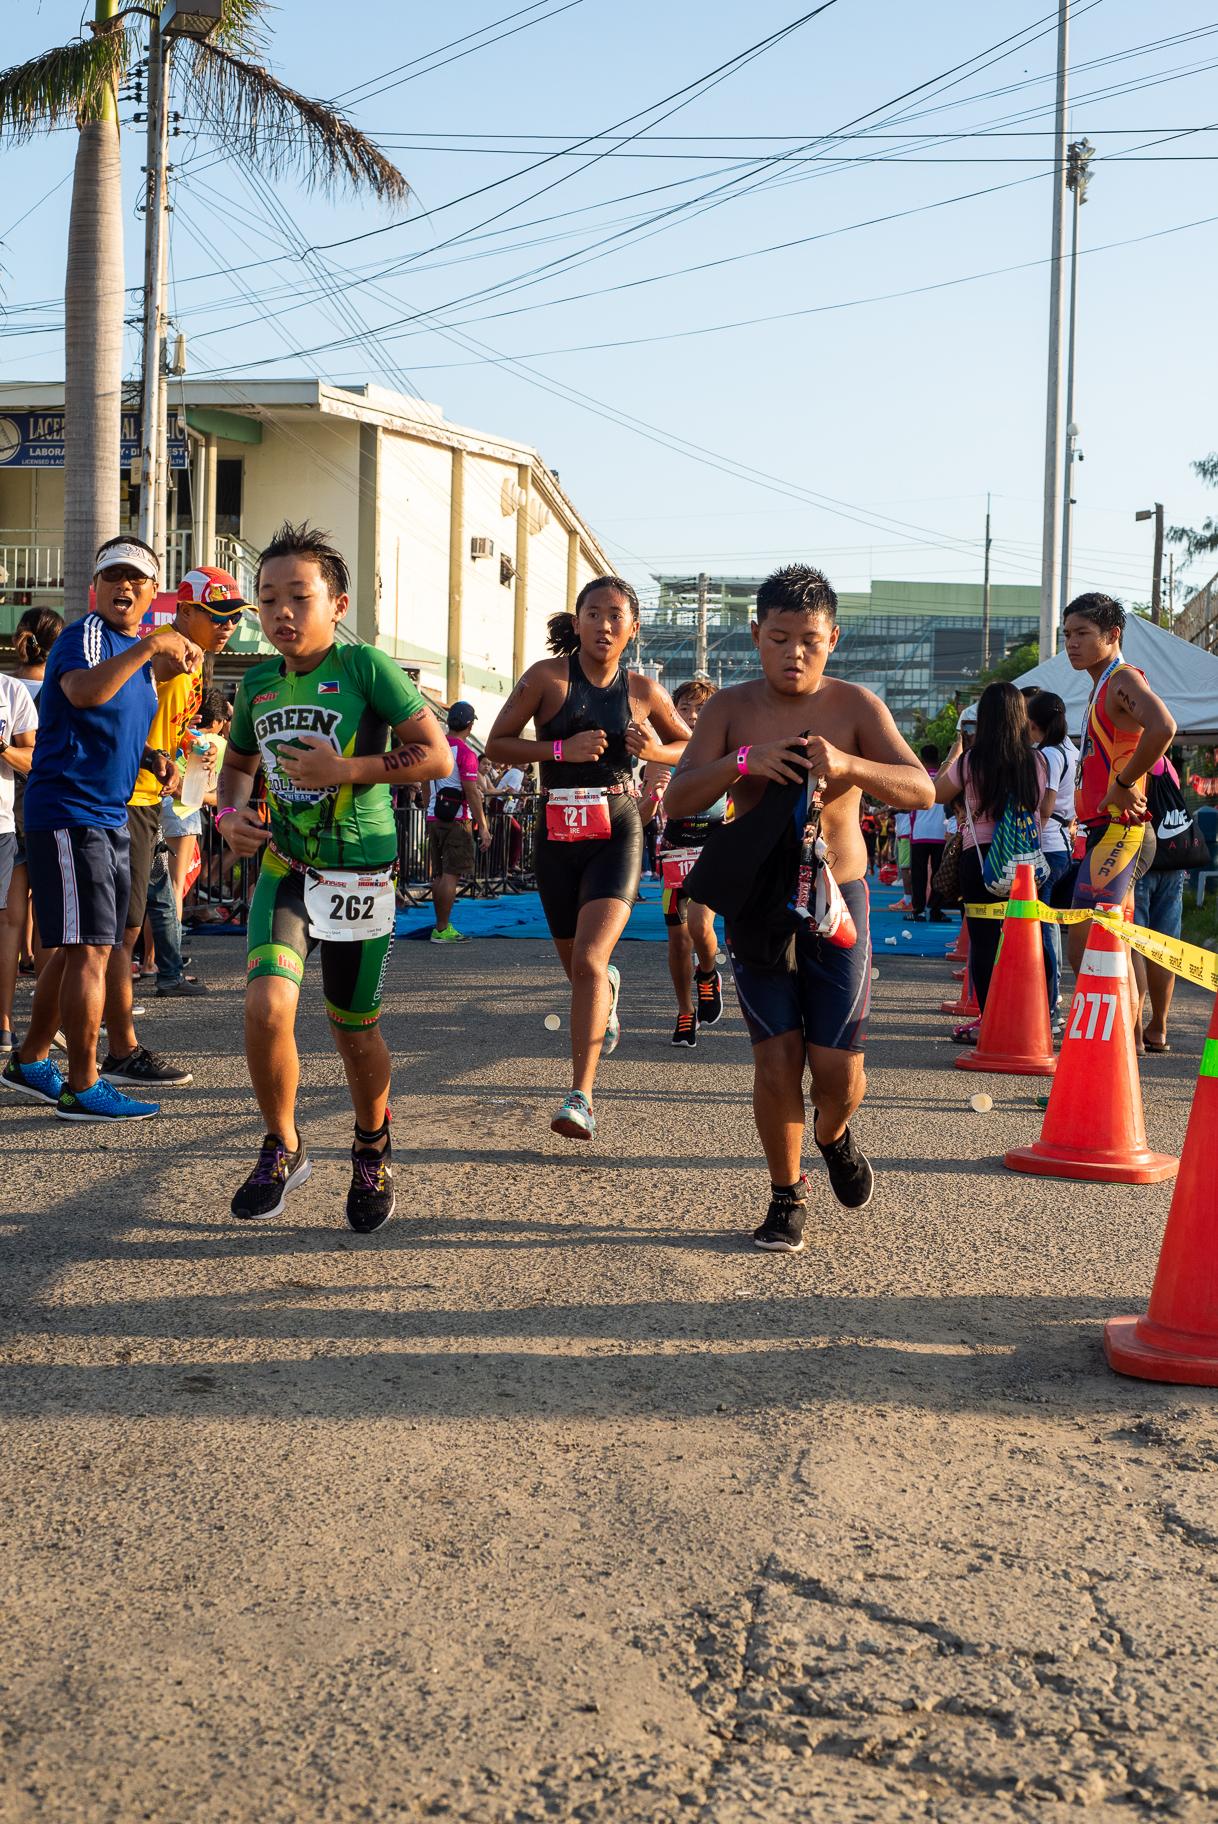 Gallery: Century Tuna Ironman 70.3 Subic Bay Alaska Ironkids 2019